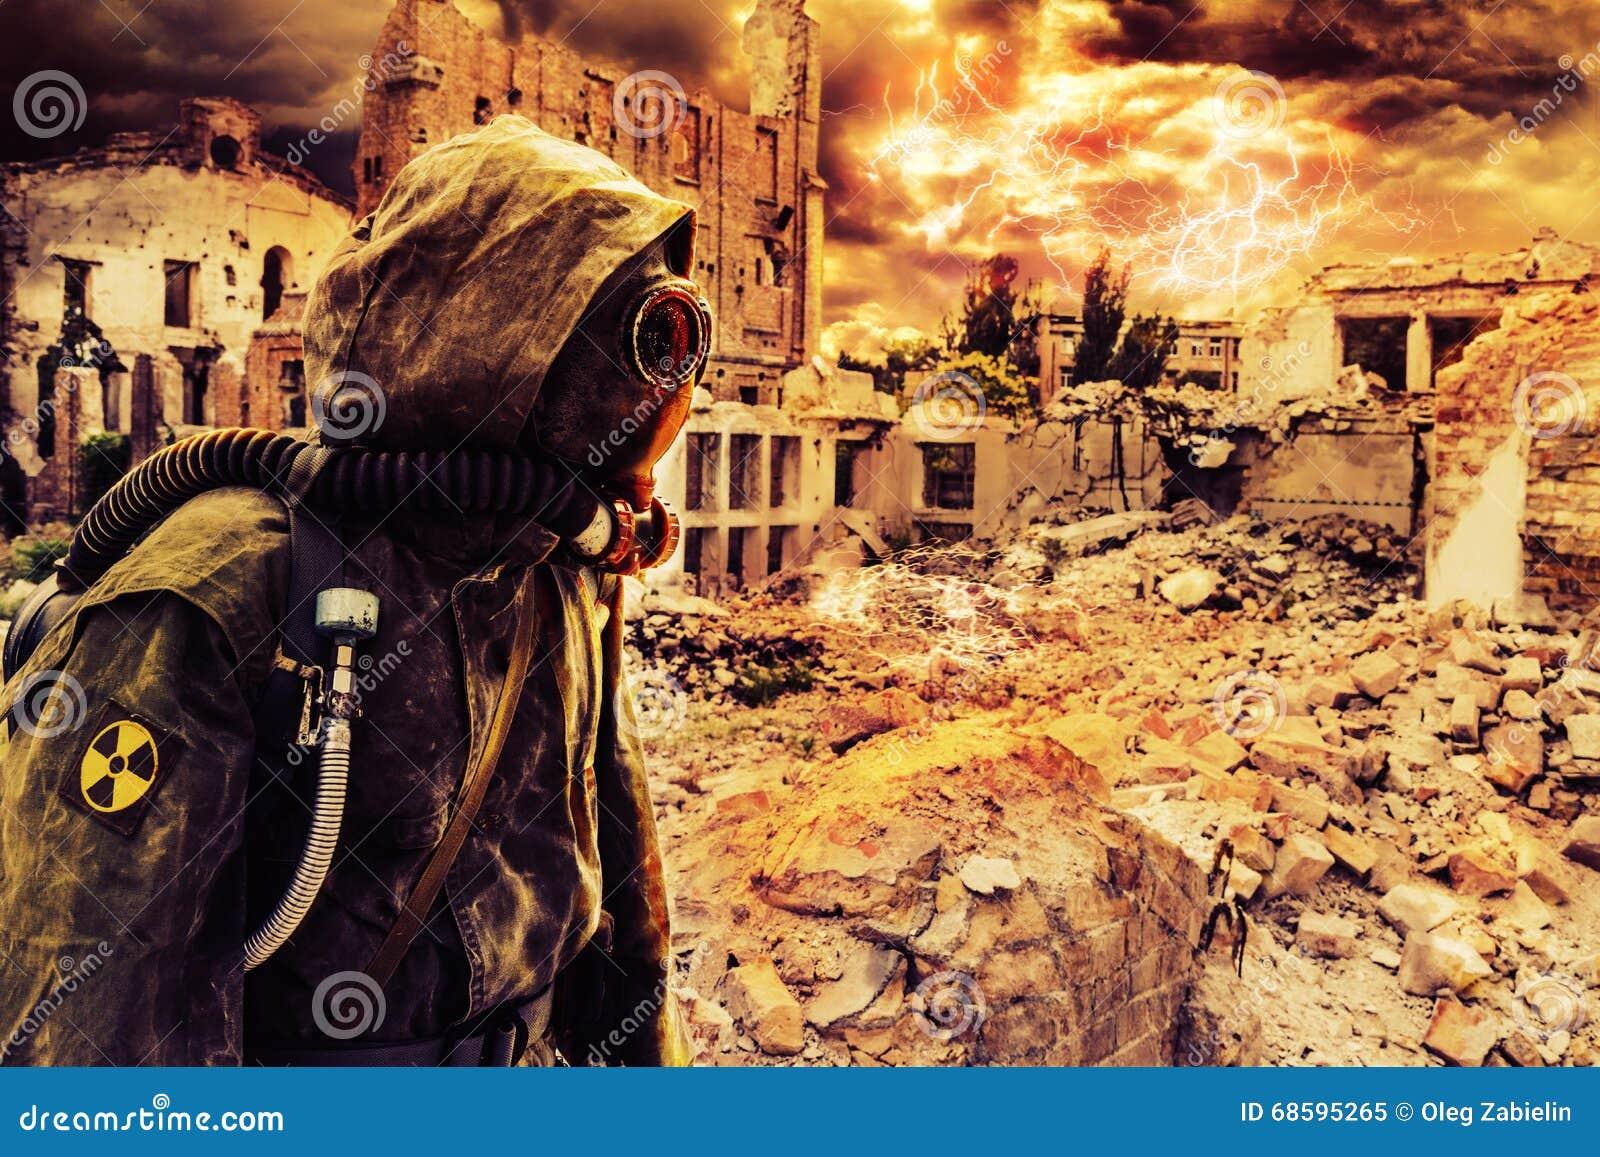 Post apocalypse sole survivor